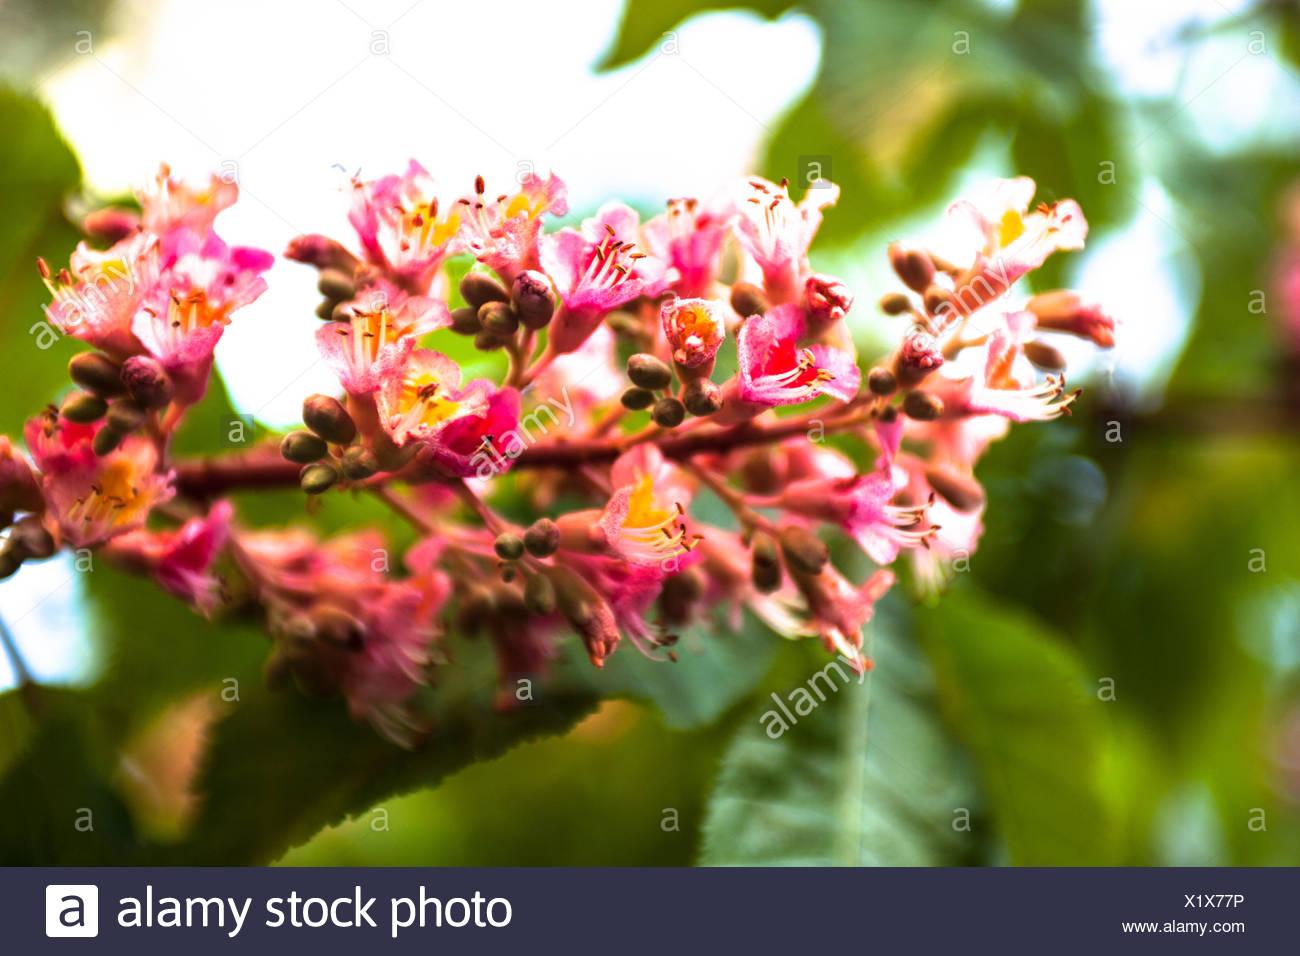 Close up pink chestnut tree stock photos close up pink chestnut bunch of pink flowers of the horse chestnut tree stock image mightylinksfo Gallery